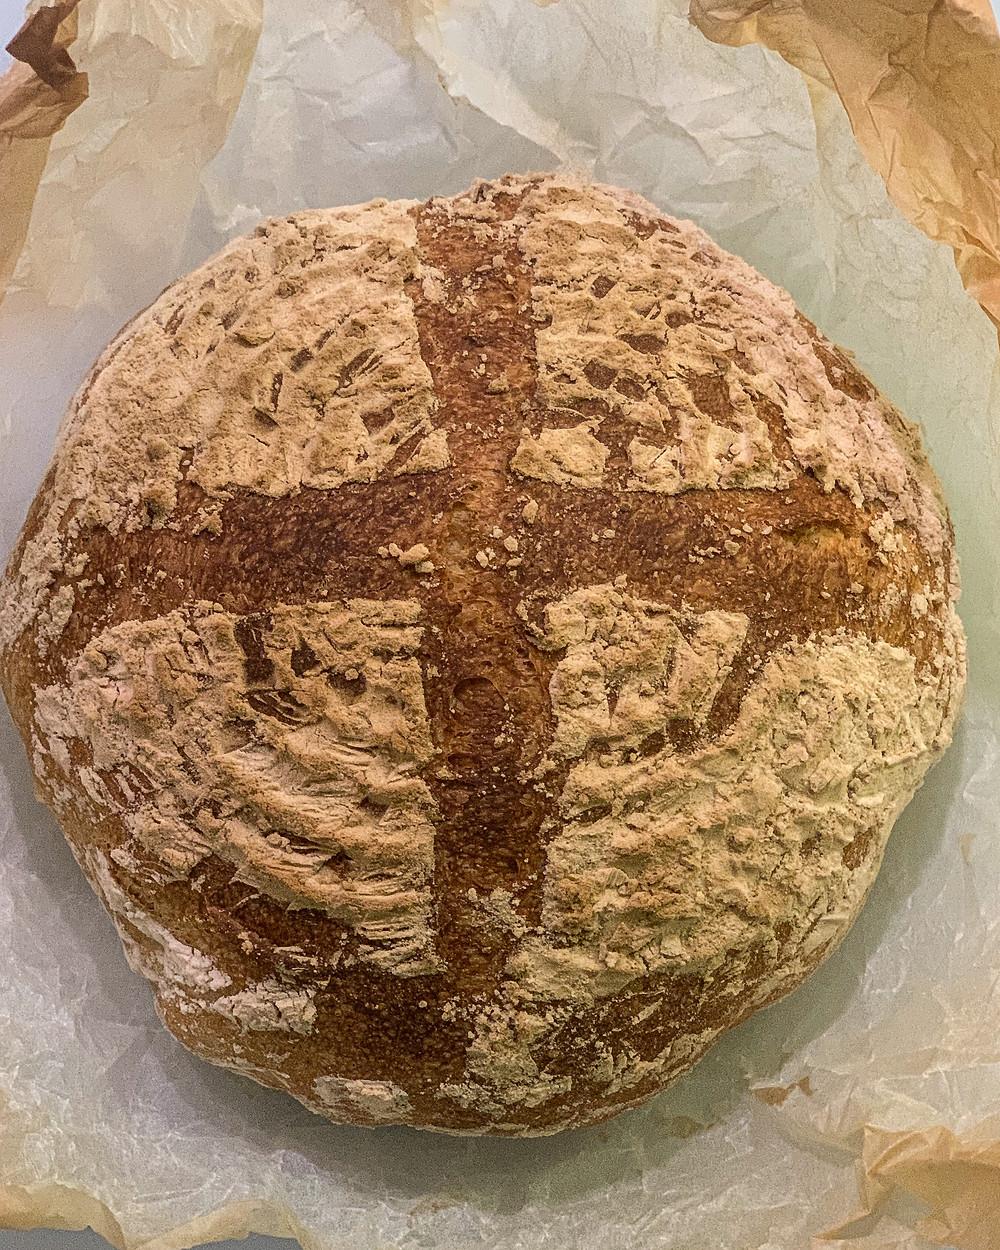 sourdough baking, droži, peka z drožmi, starter, kruh, kislo testo, helenine čarovnije, krušna moka, jogurt, testo z jogurtom, sourdougmania, dober kruh, recept za kruh